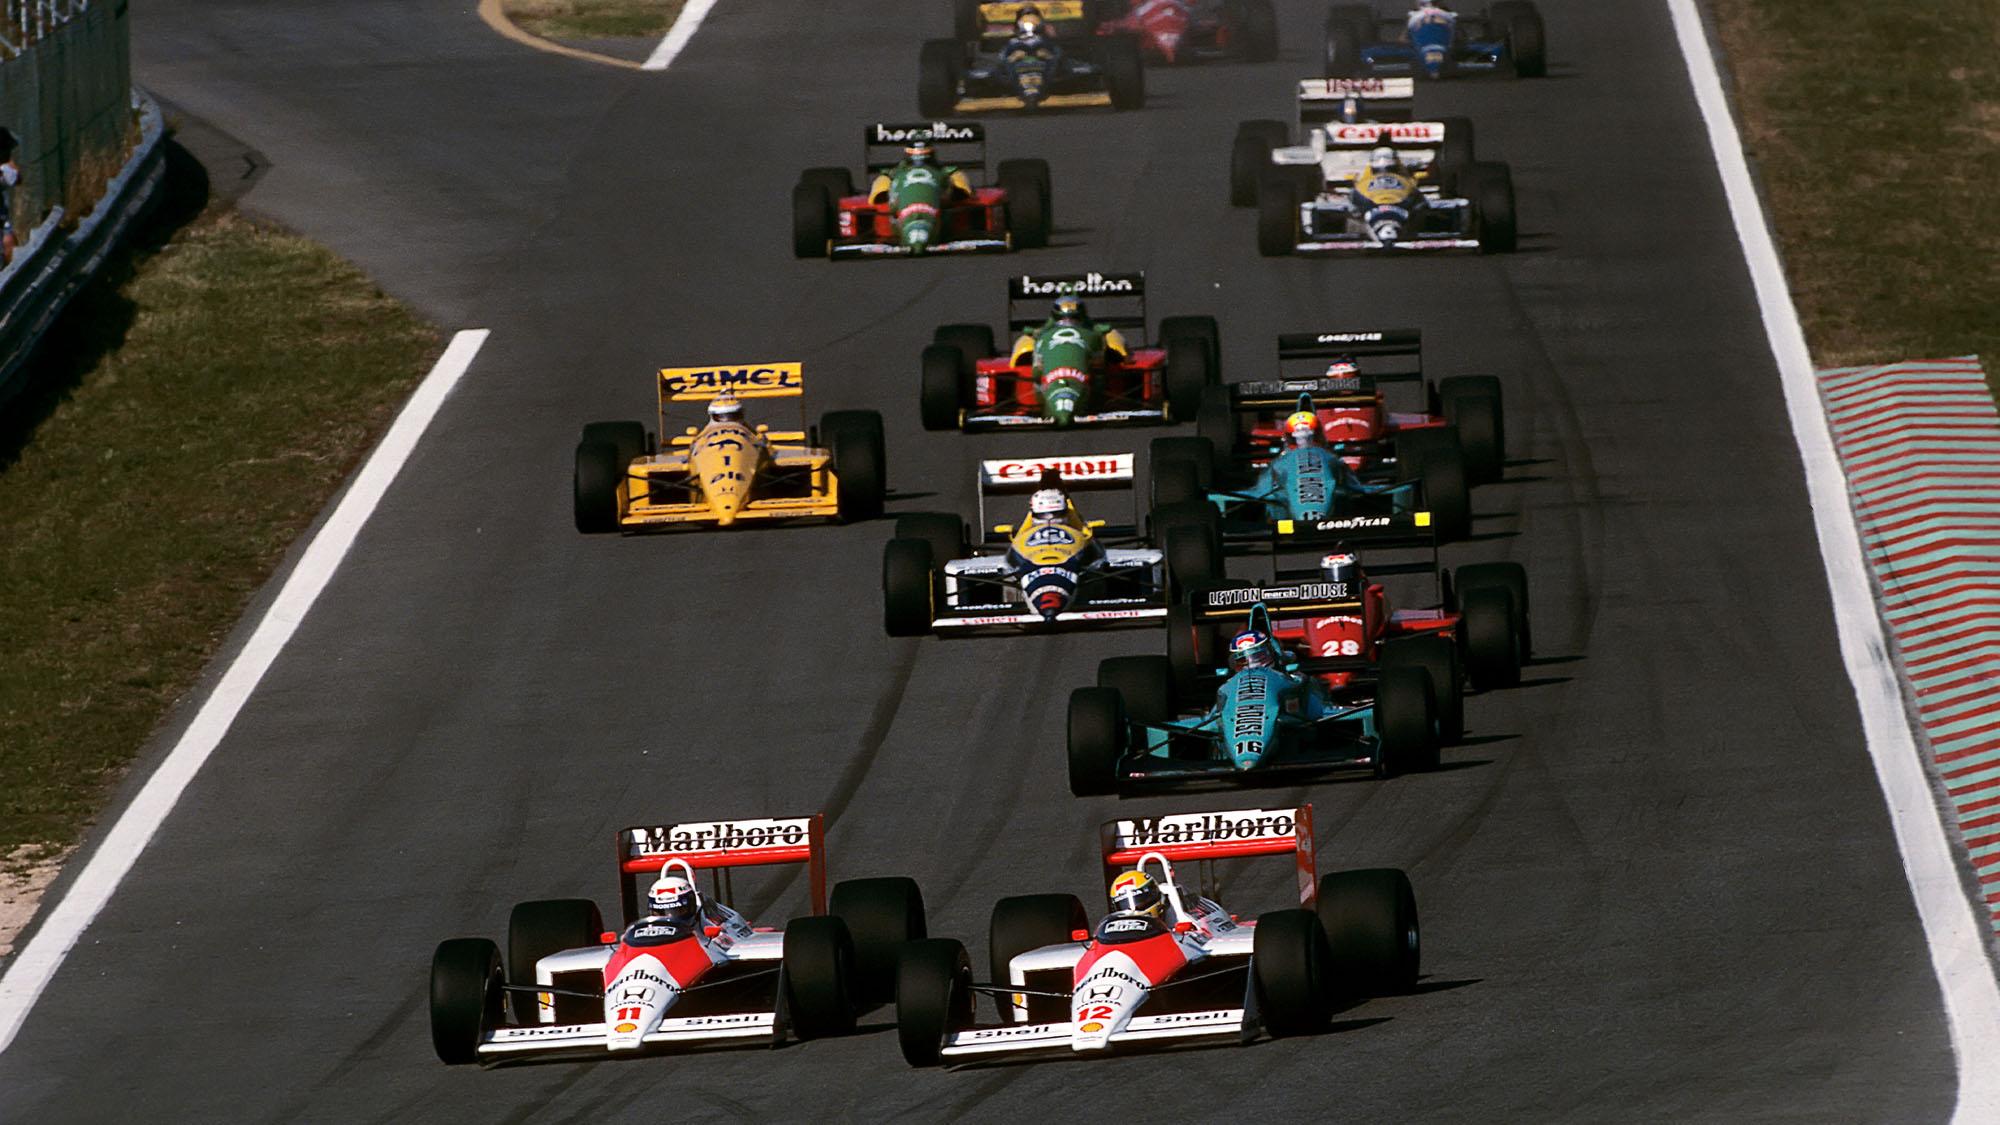 Ayrton Senna, Alain Prost, McLaren-Honda MP4/4, Grand Prix of Portugal, Estoril, 25 September 1988. (Photo by Paul-Henri Cahier/Getty Images)